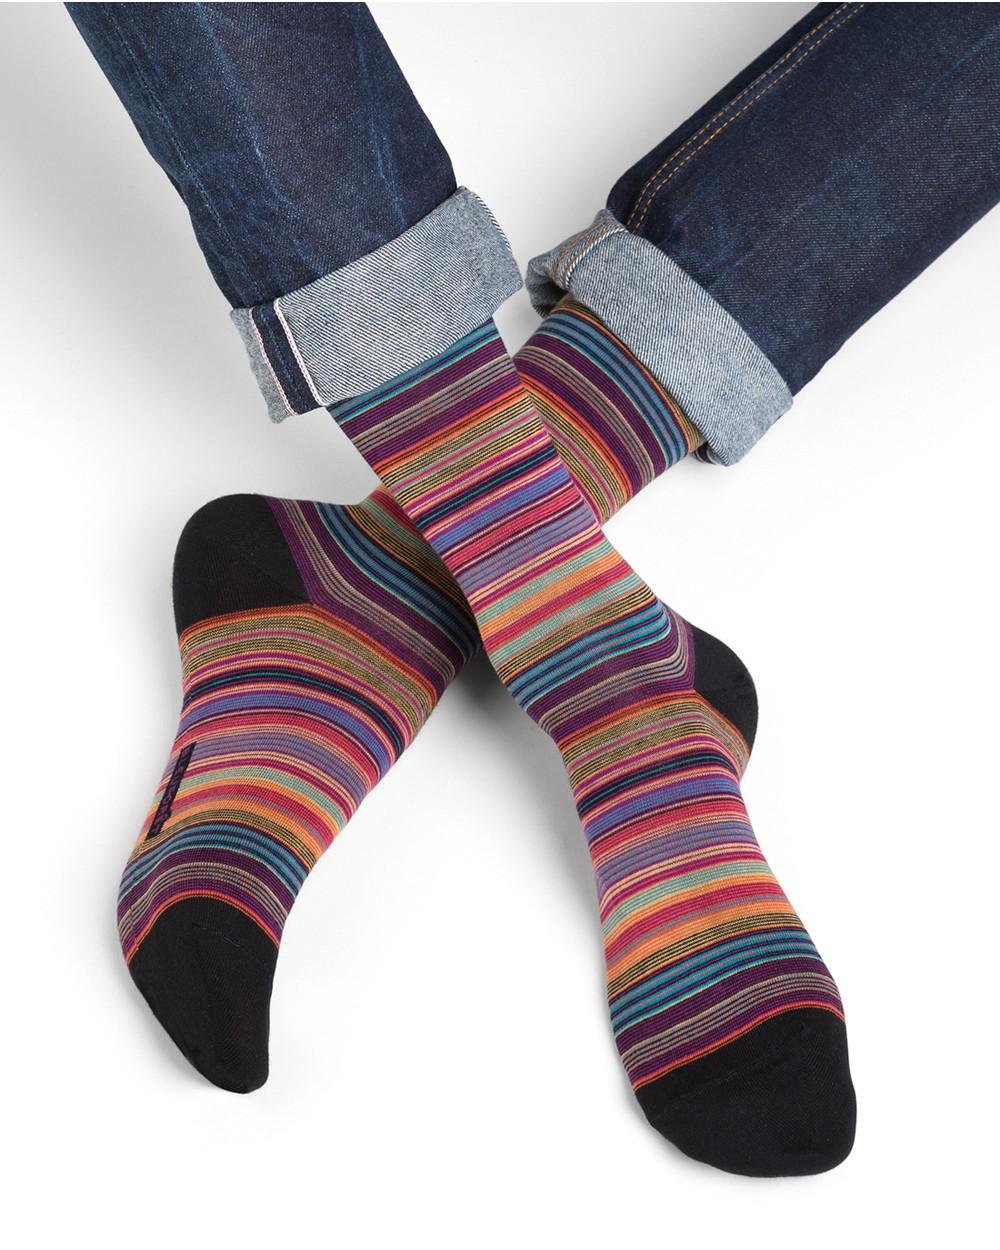 Narrow stripe cotton socks